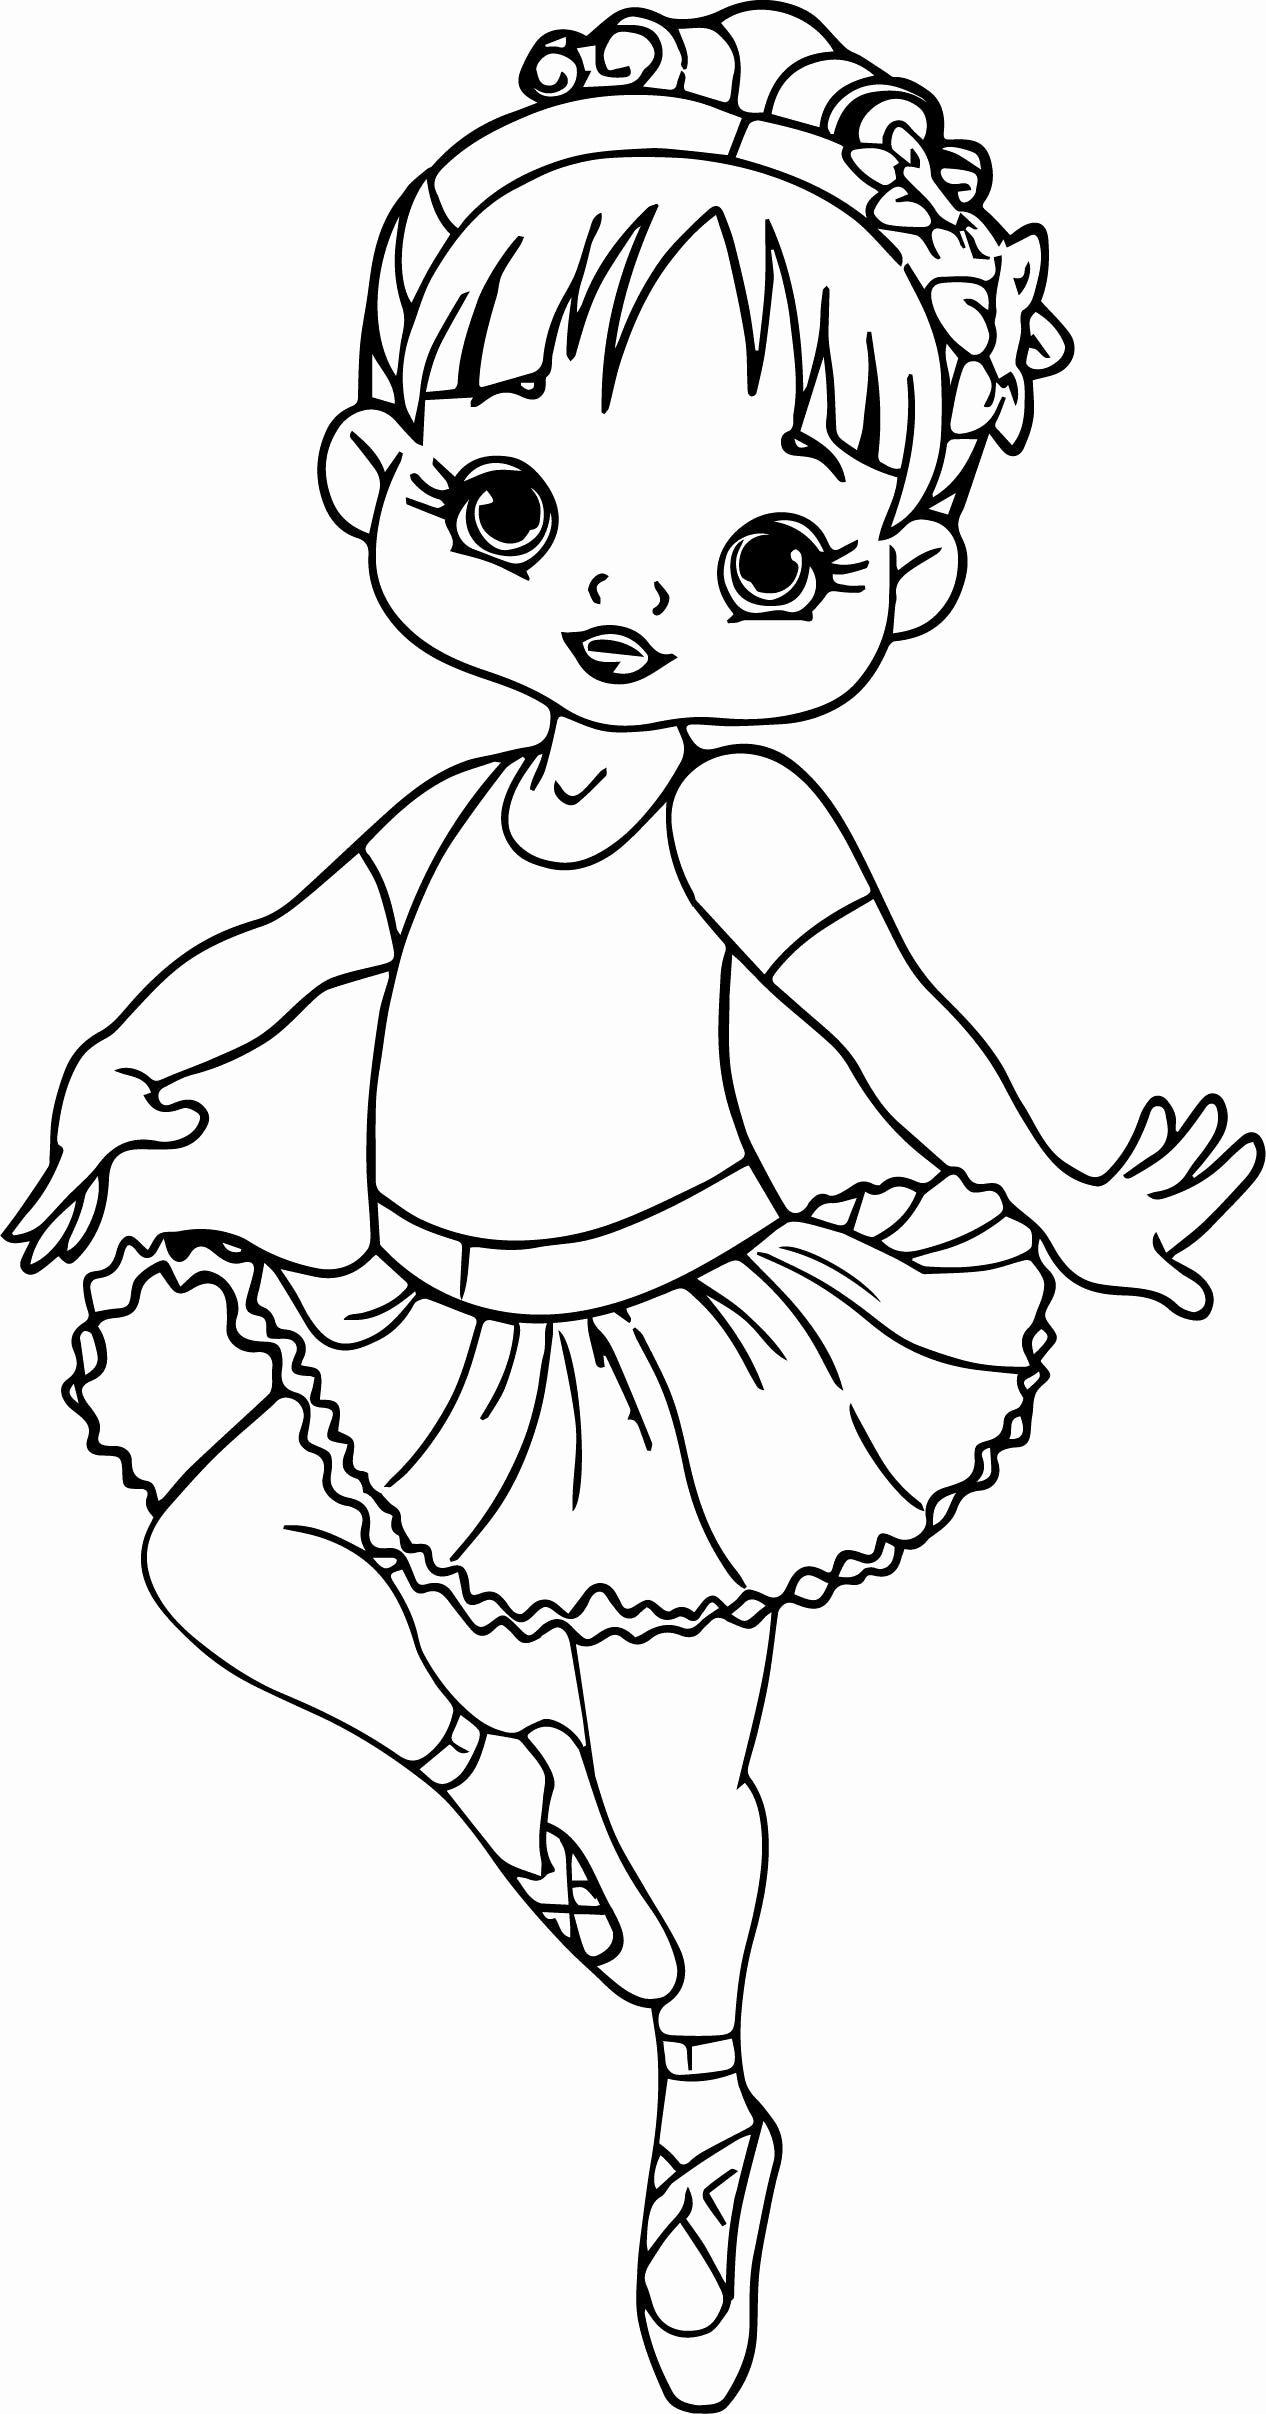 Cartoon Coloring Pages Printable Unique Coloring Pages